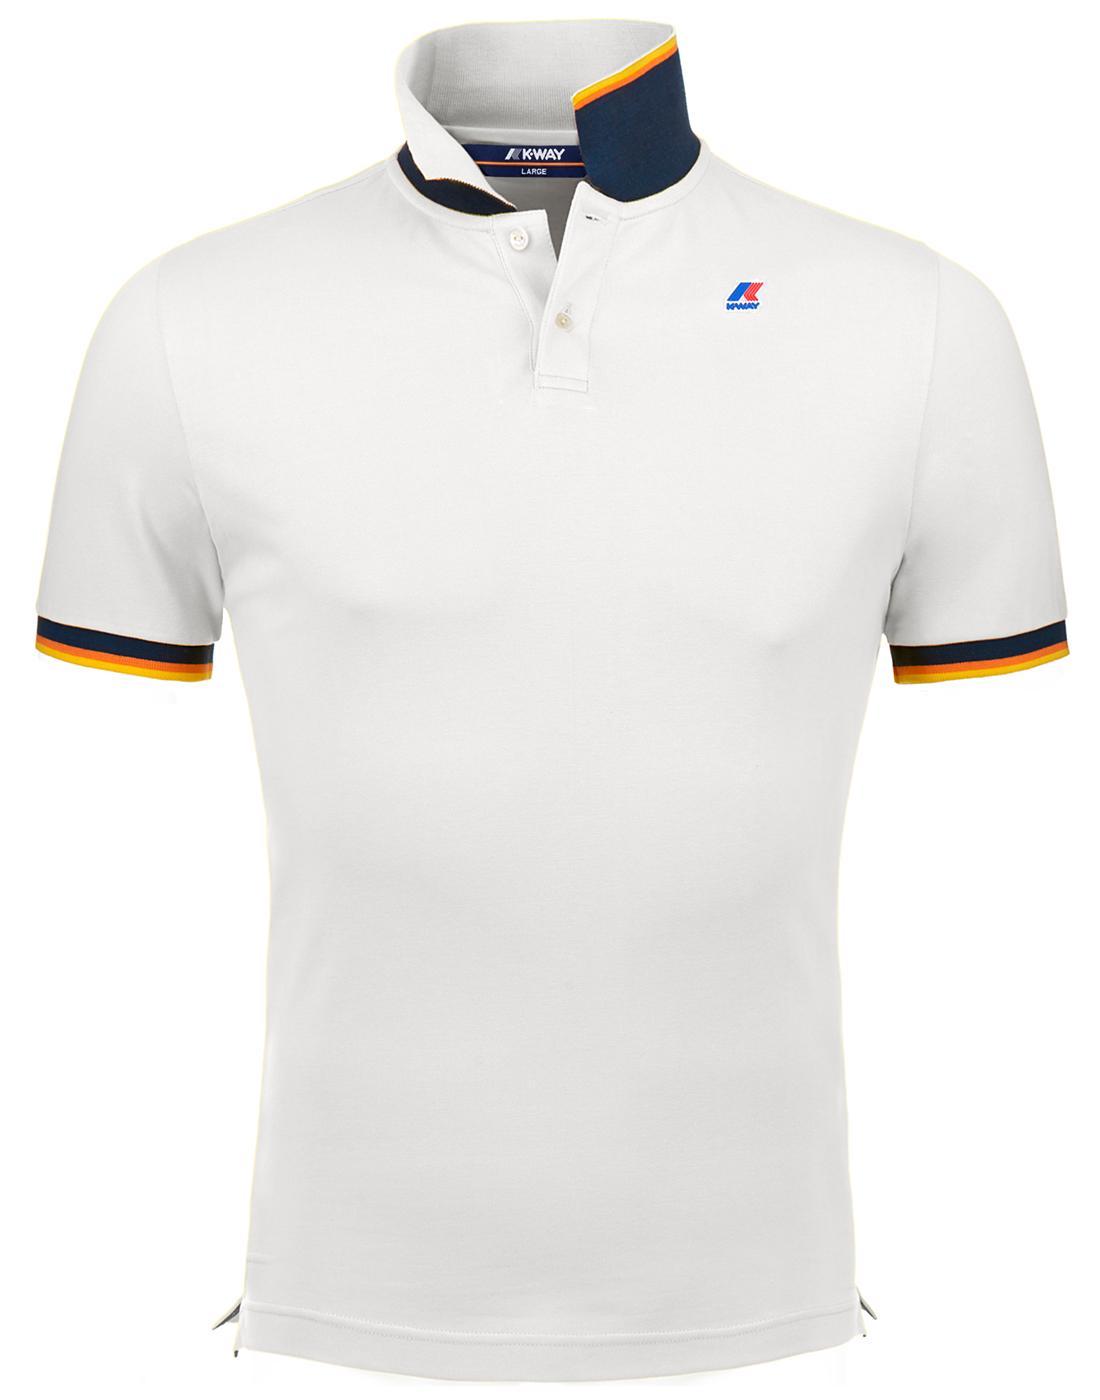 Vincent K-WAY Men's Retro Pique Polo Shirt White